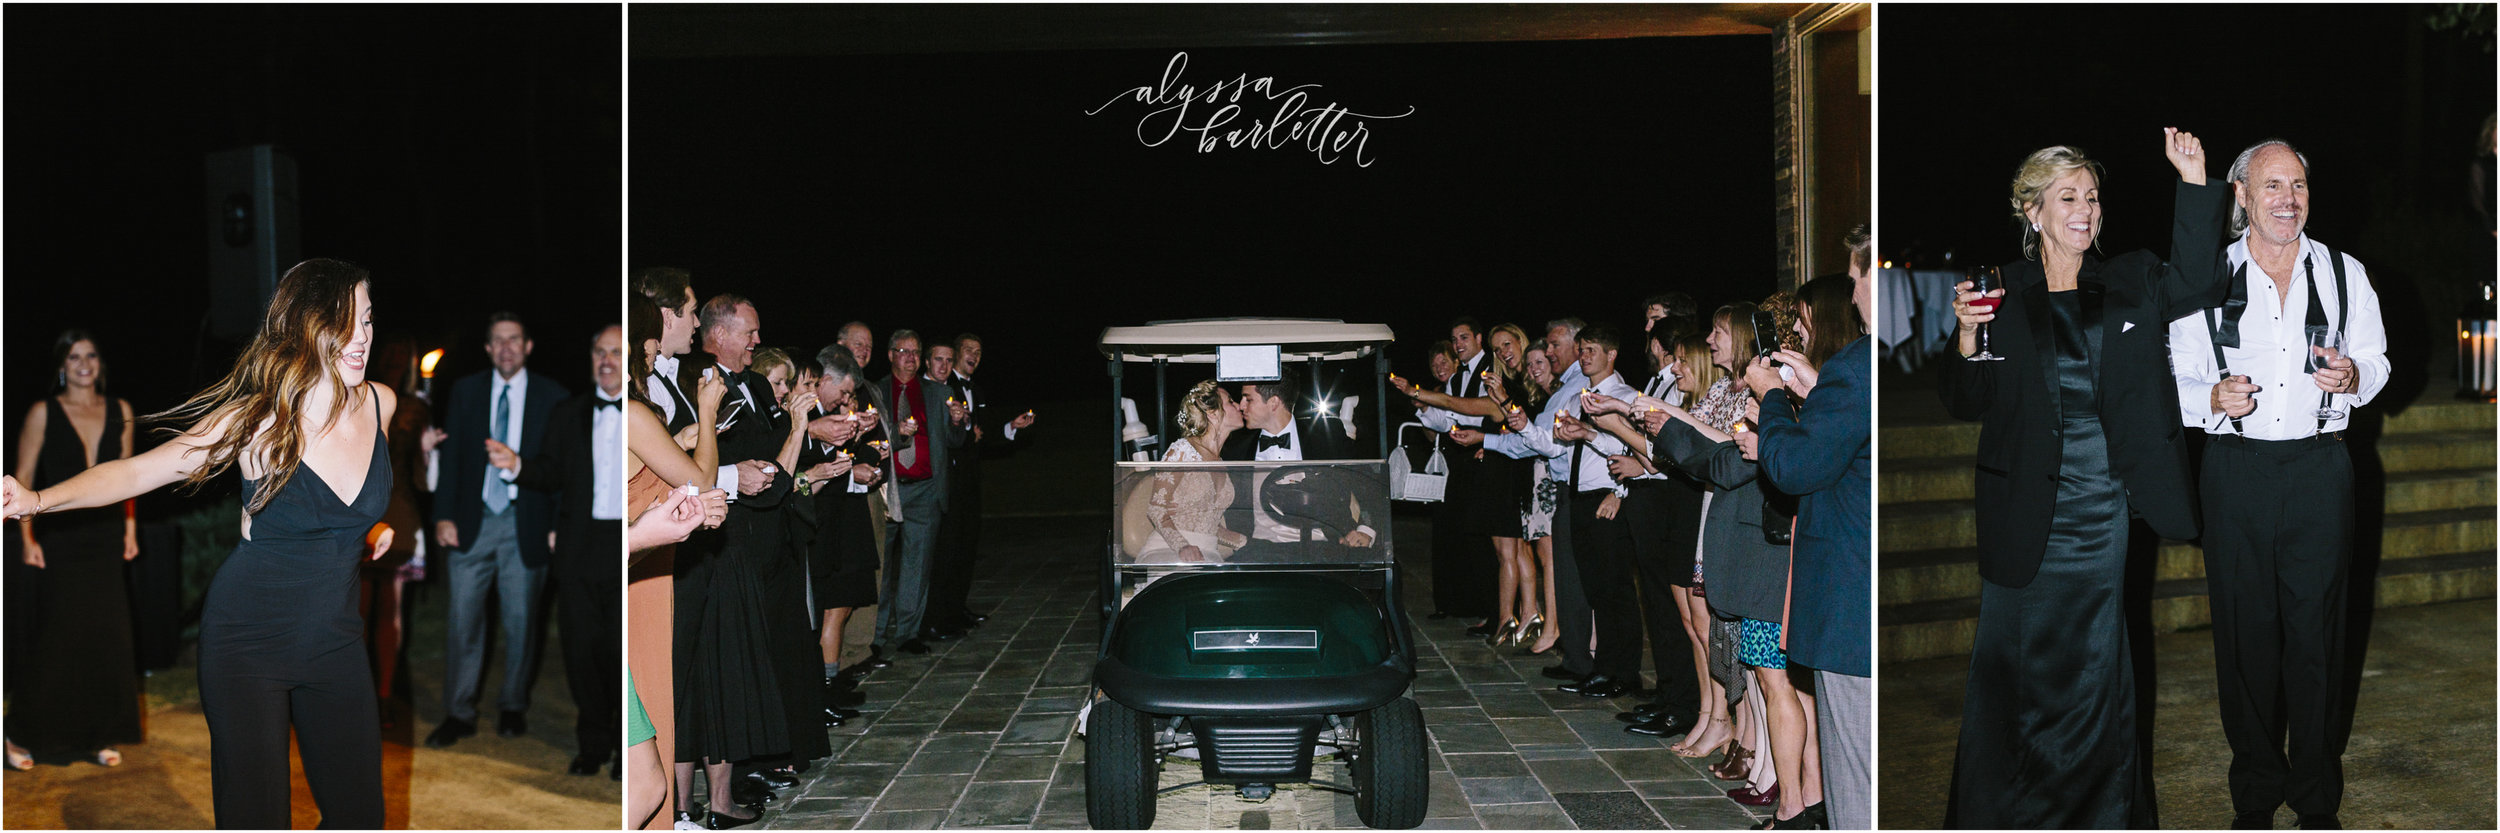 alyssa barletter photography fayetteville arkansas wedding photos micah and colin-1-72.jpg